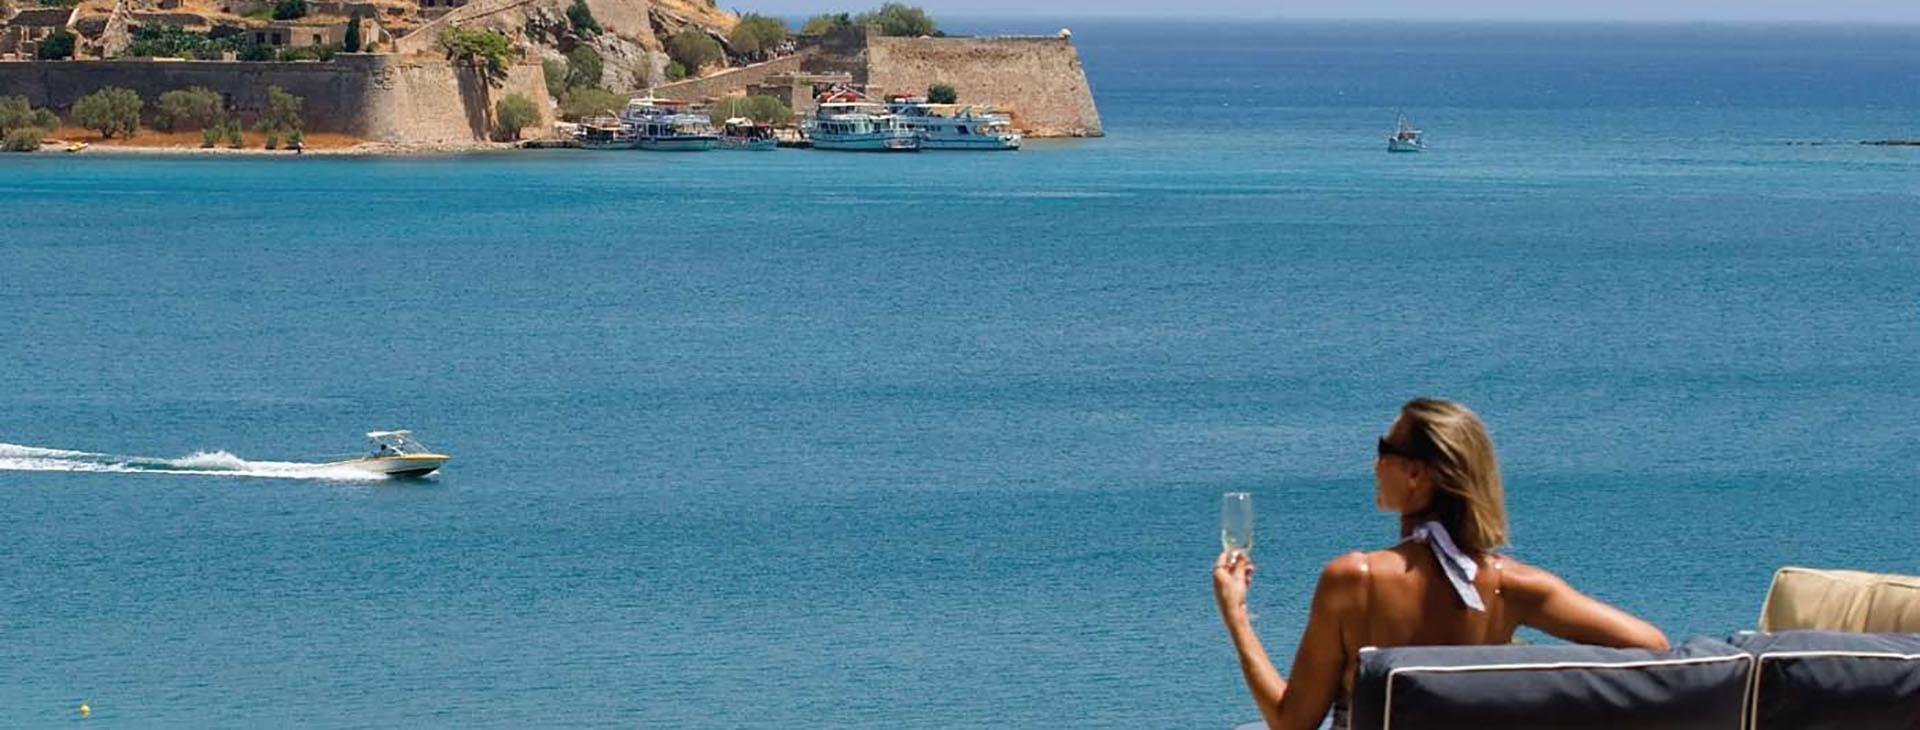 View of Spinalonga Isle, Elounda, Lassithi